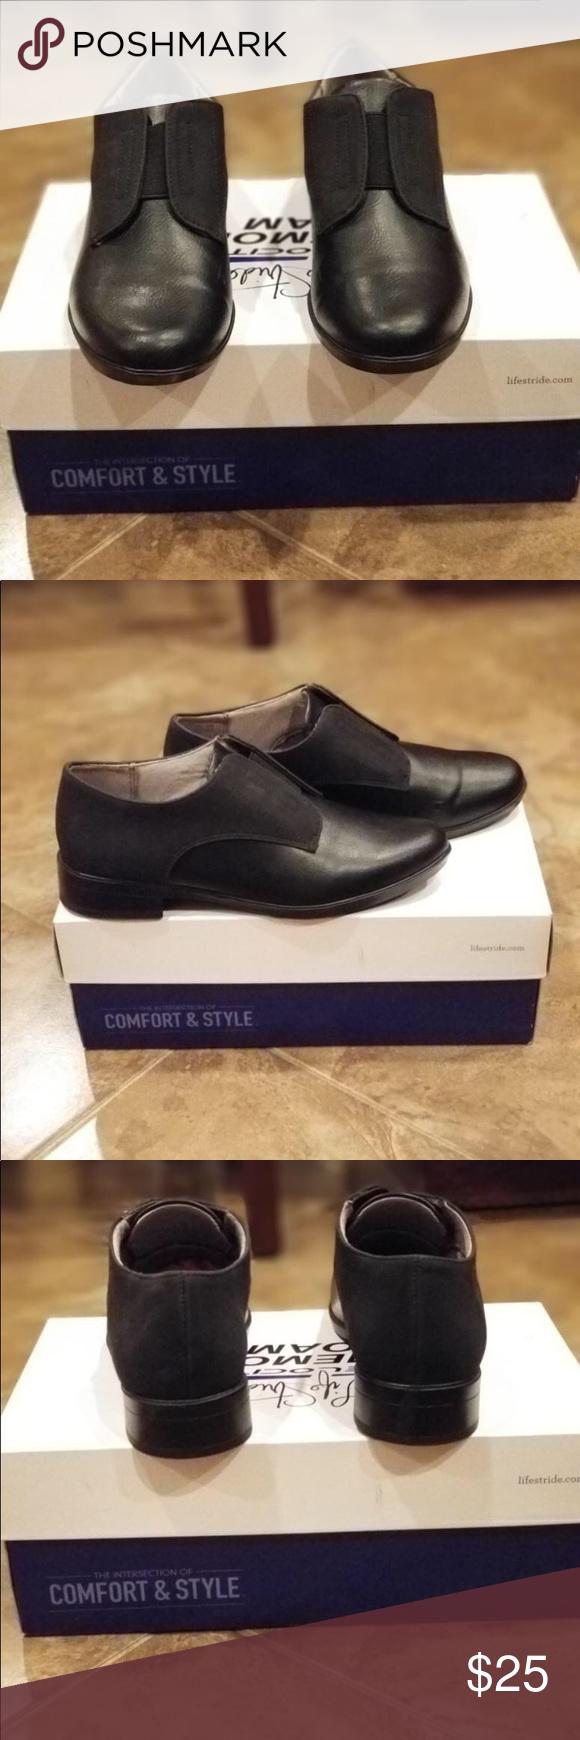 Style stride memory foam shoes 6.5